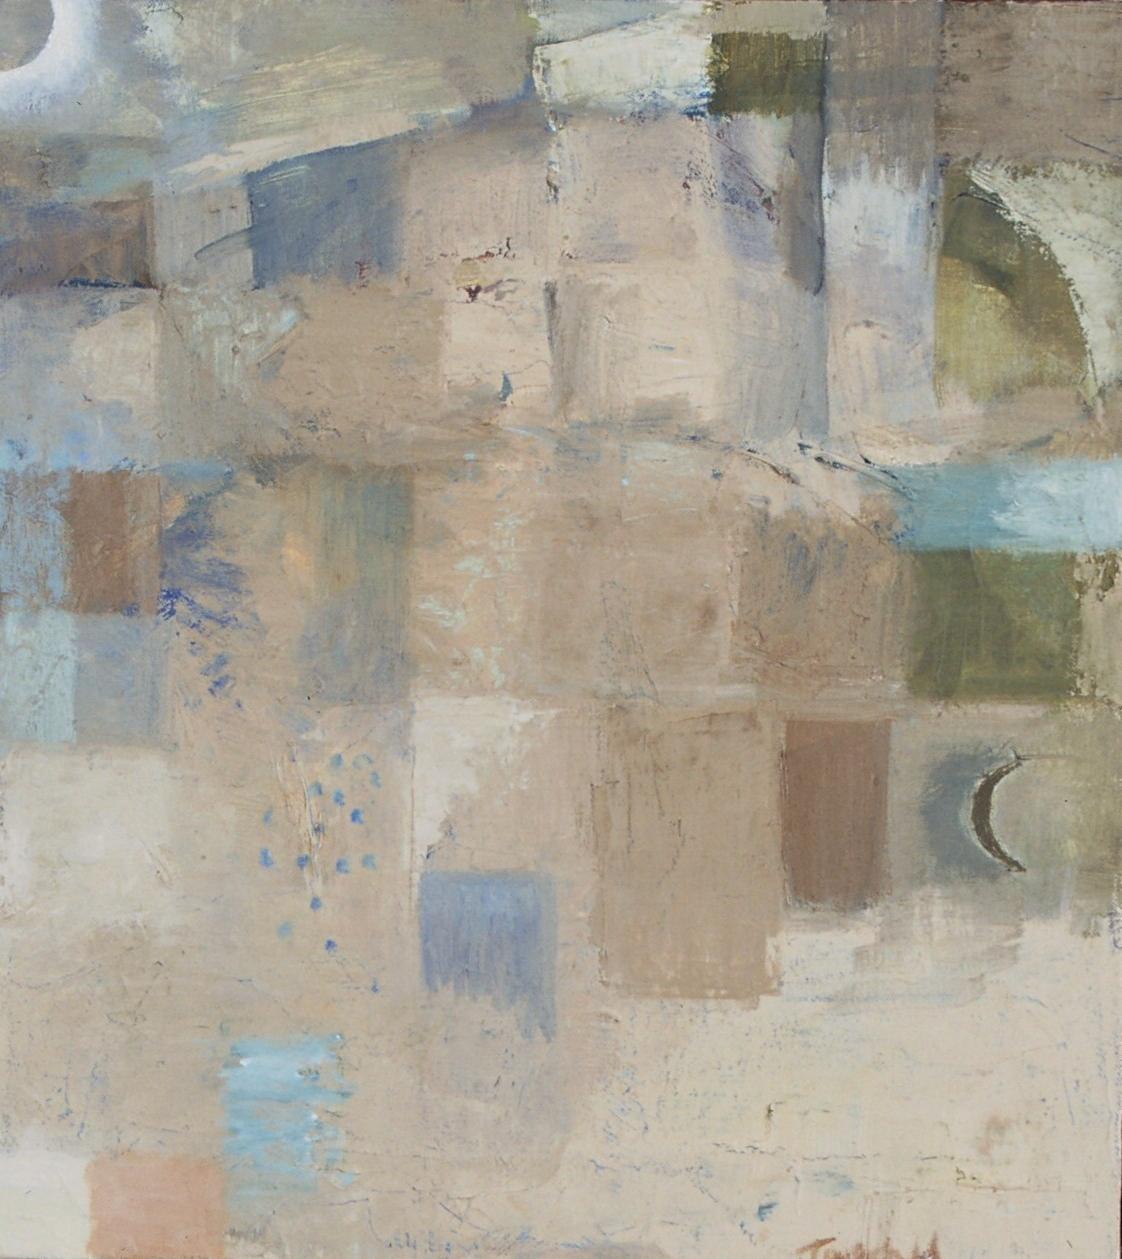 "Desert , oil on canvas, 16"" x 14"", 2001"